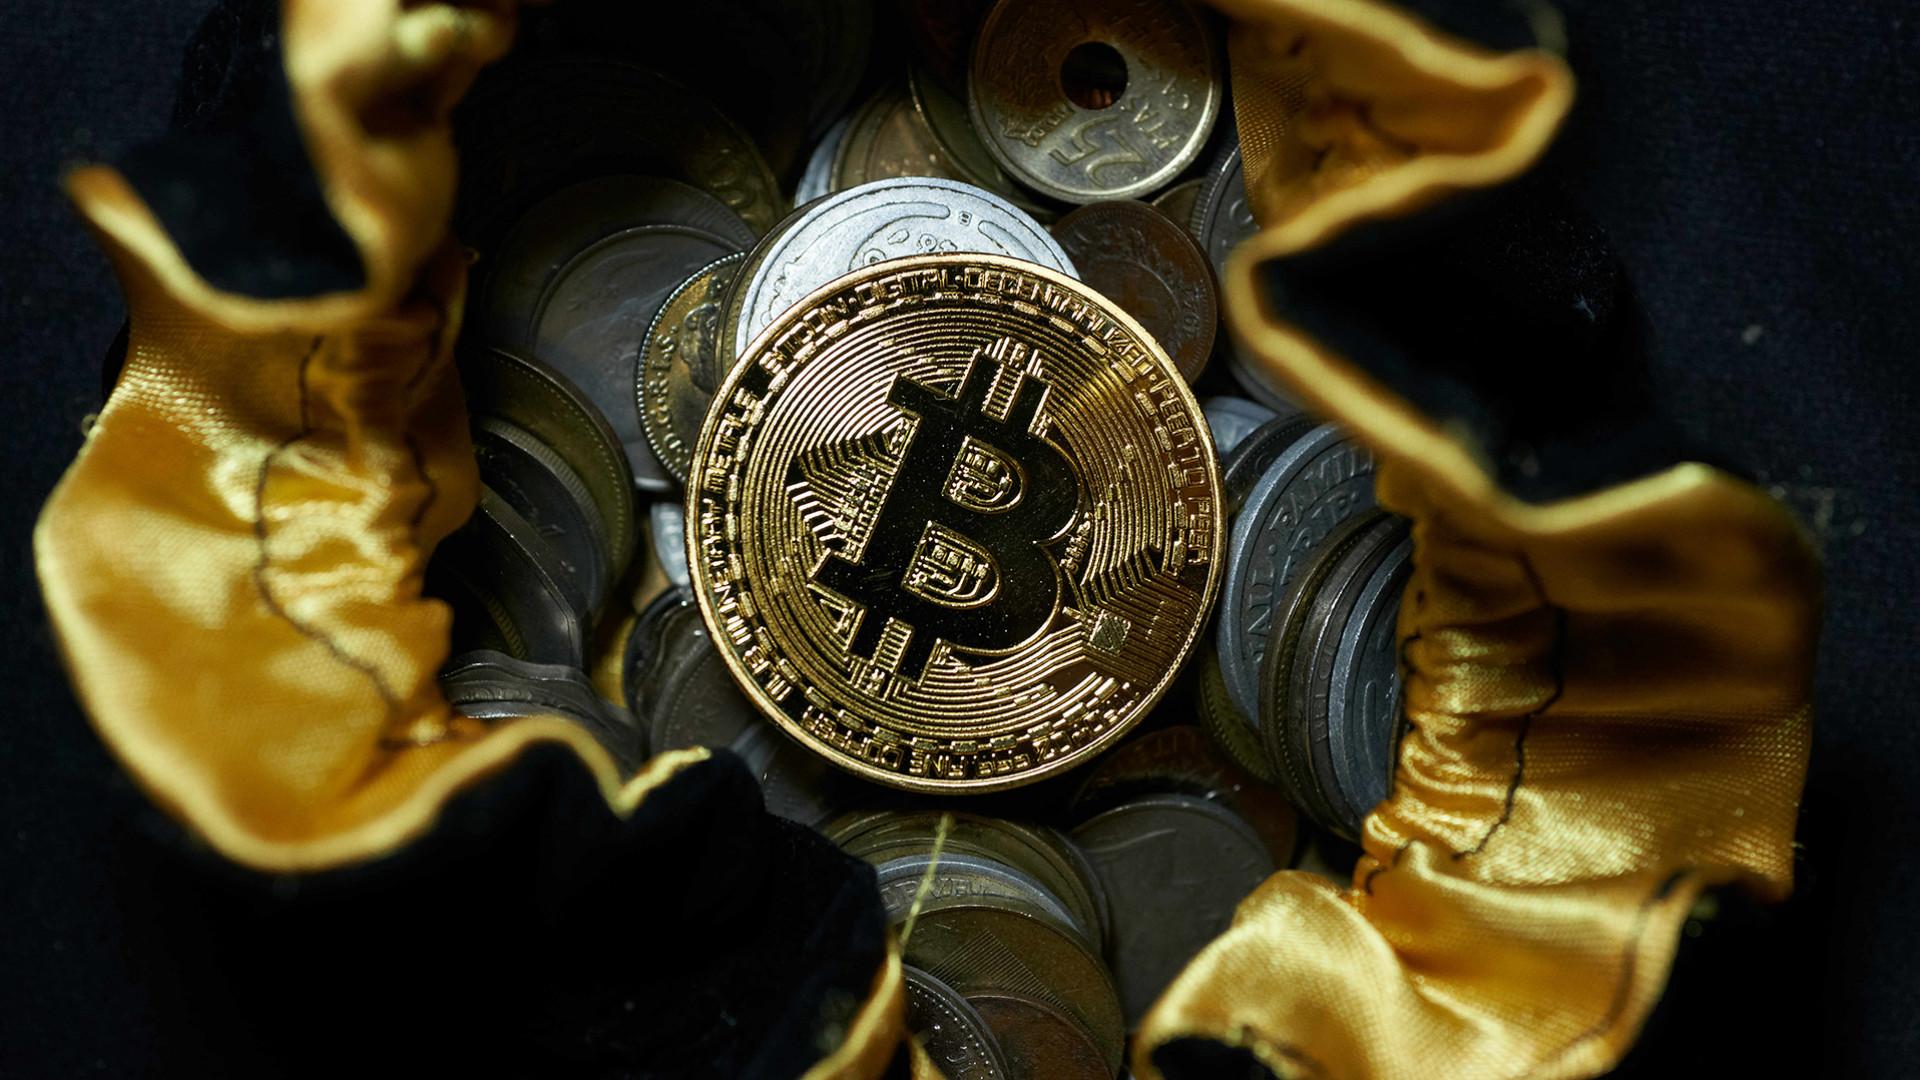 Биткоин занял 11 место в рейтинге Weiss Crypto Ratings